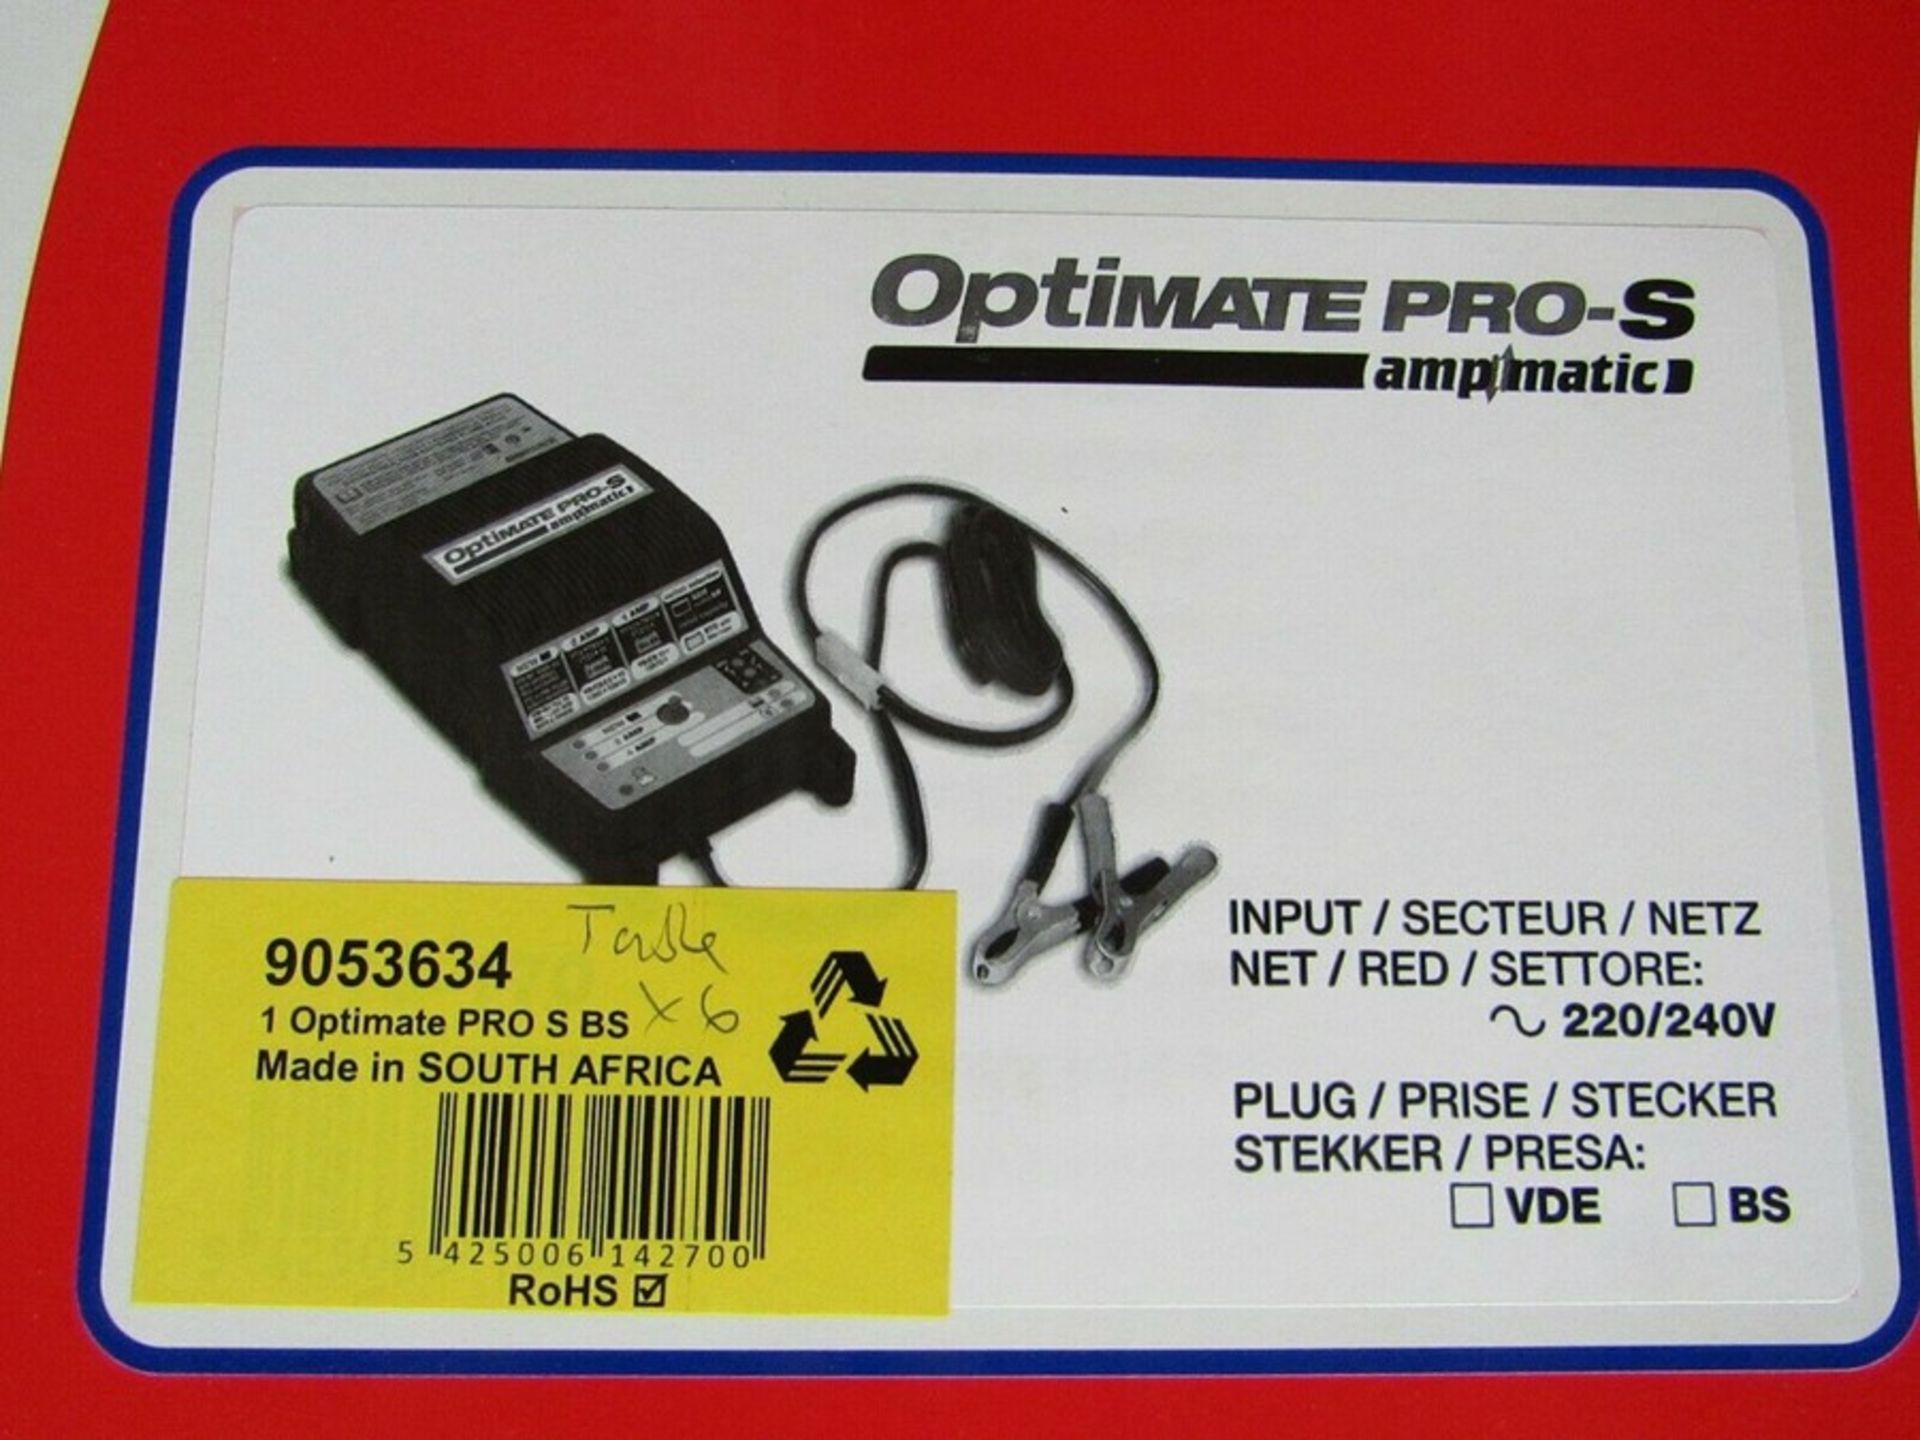 TecMate OptiMate PRO-S Lead Acid 12V 4A Battery Charger UK plug table 9053634 - Image 2 of 2